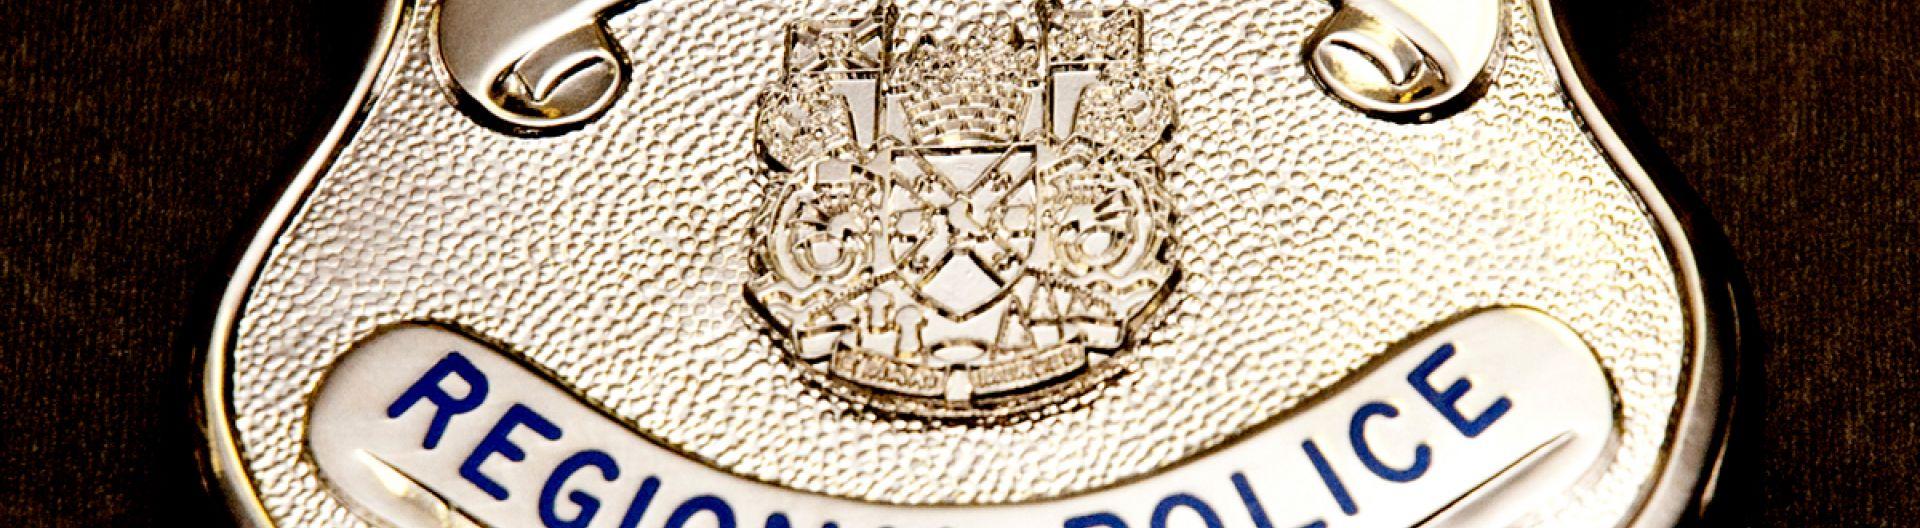 Criminal Investigation Division Halifax